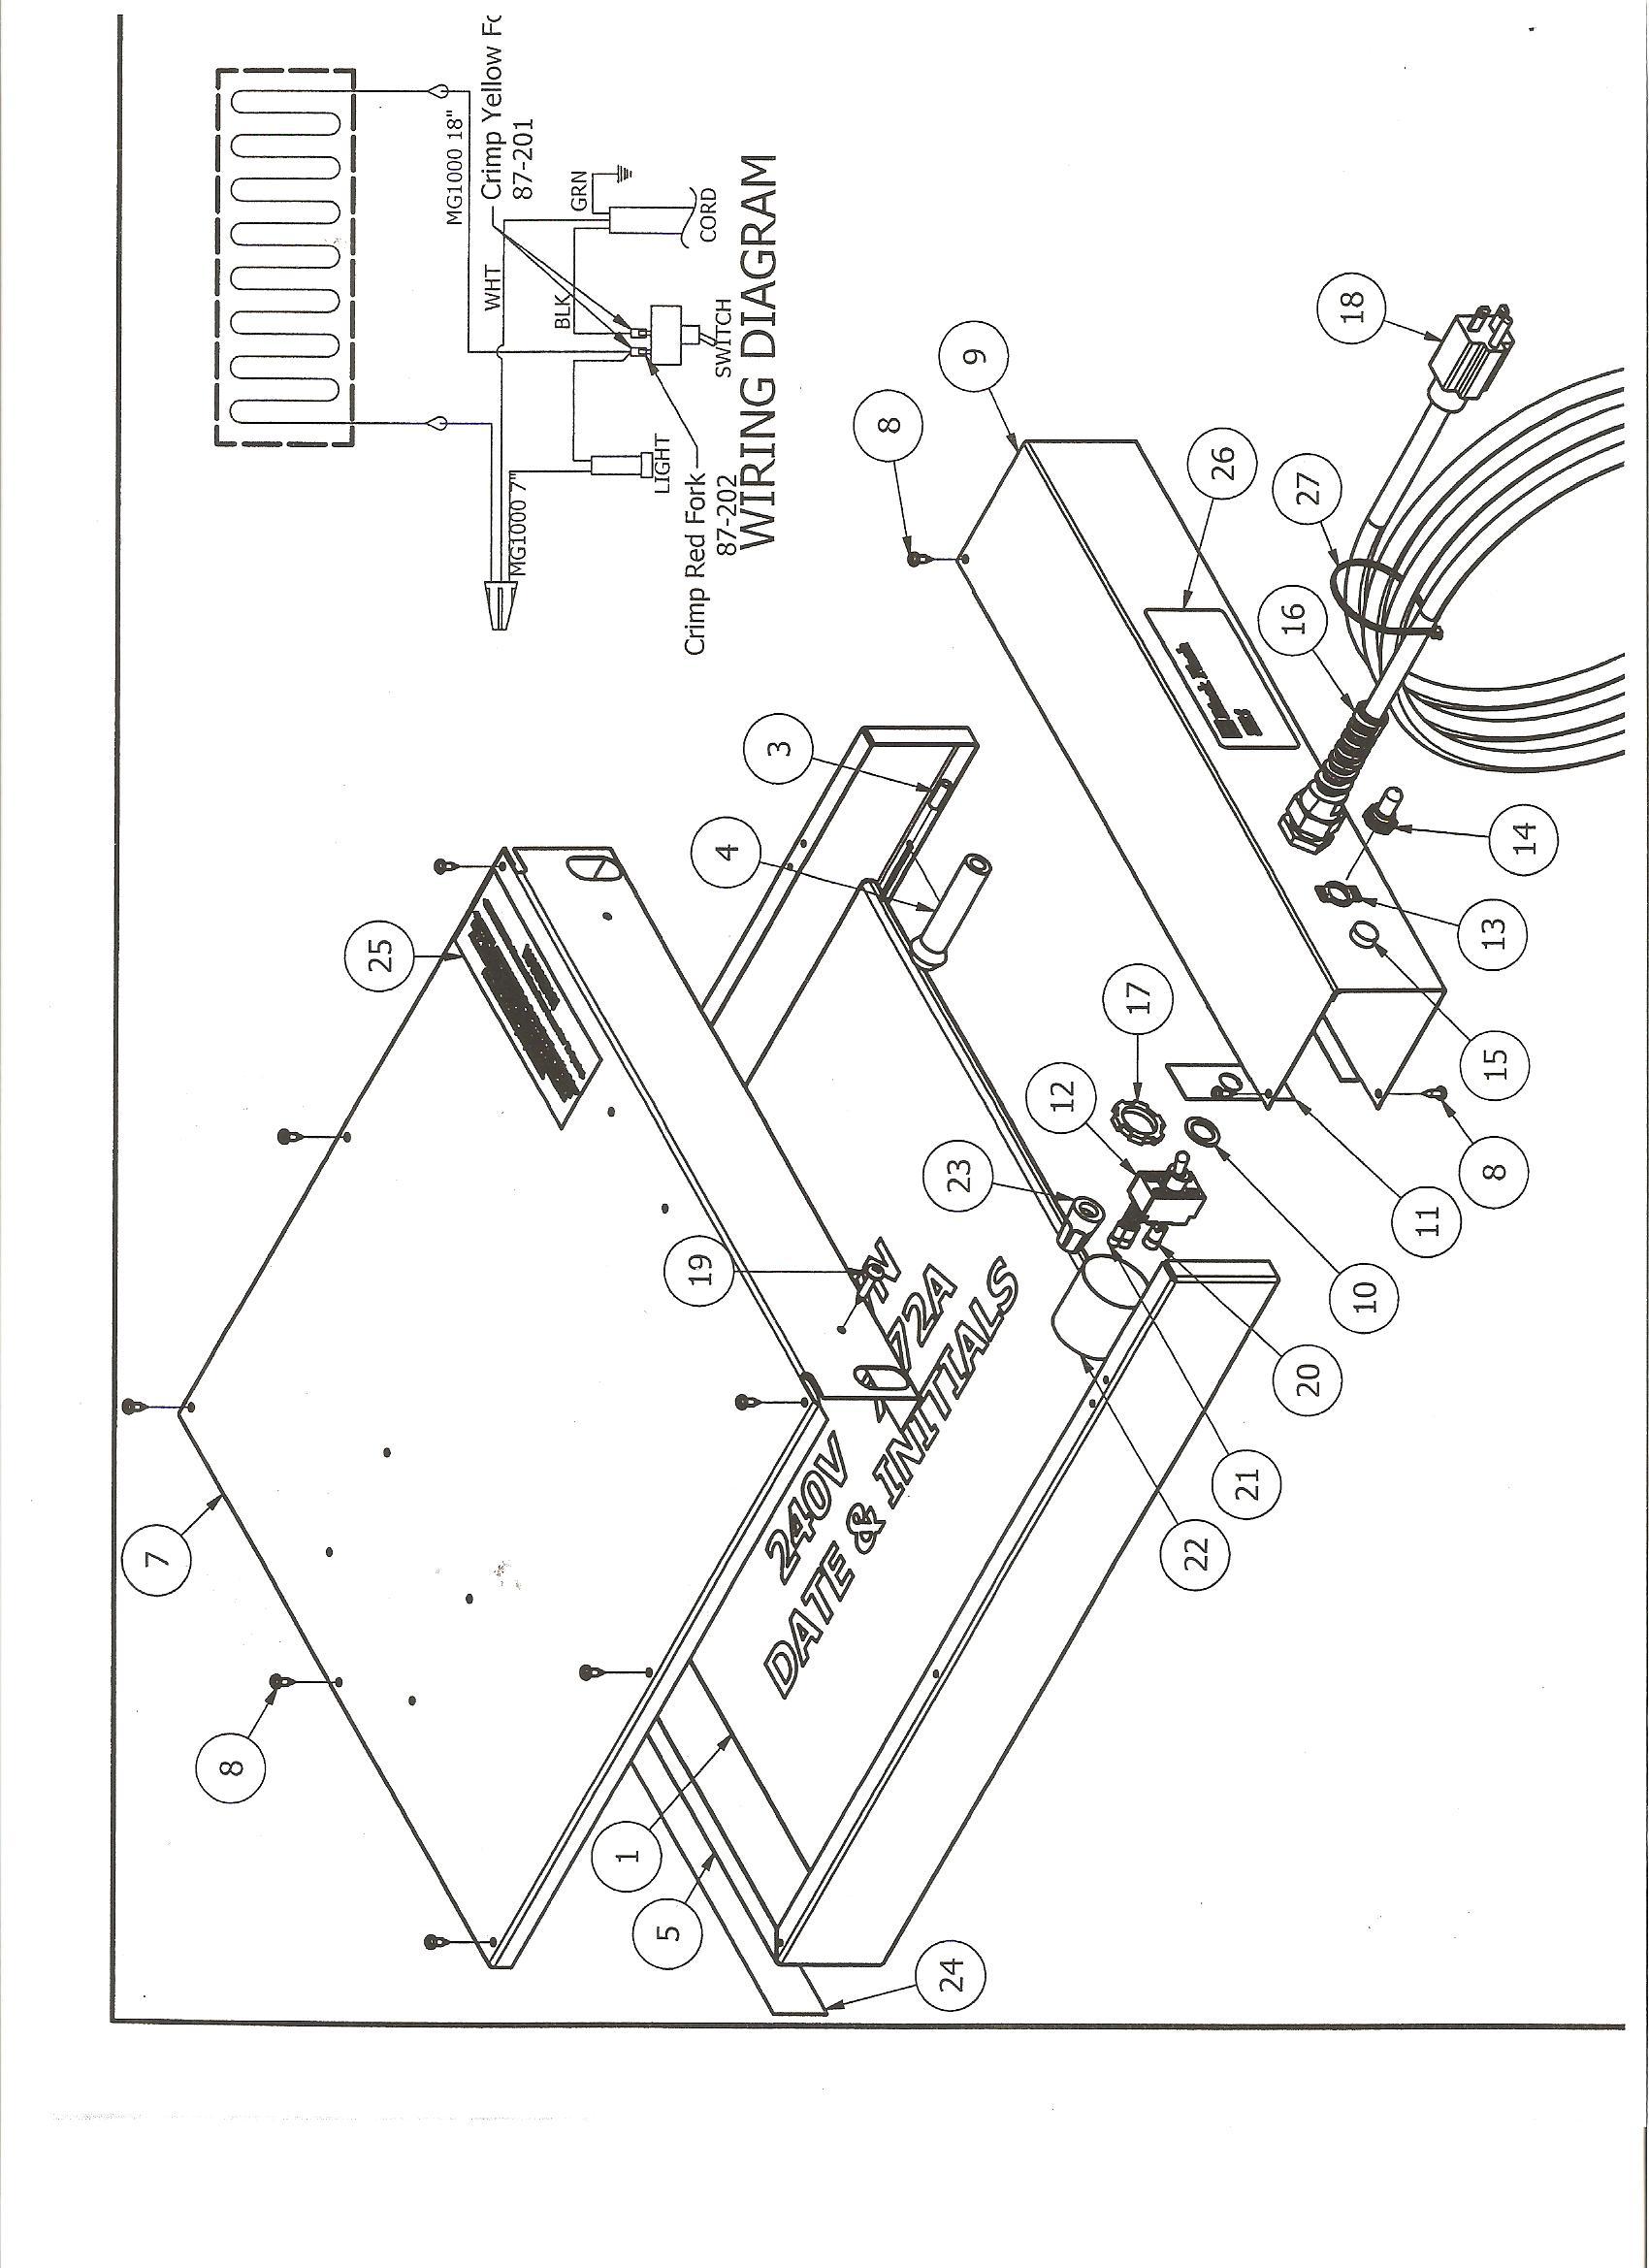 Wiring Heating Element For Diy Conveyor Dryer T Shirt Forums